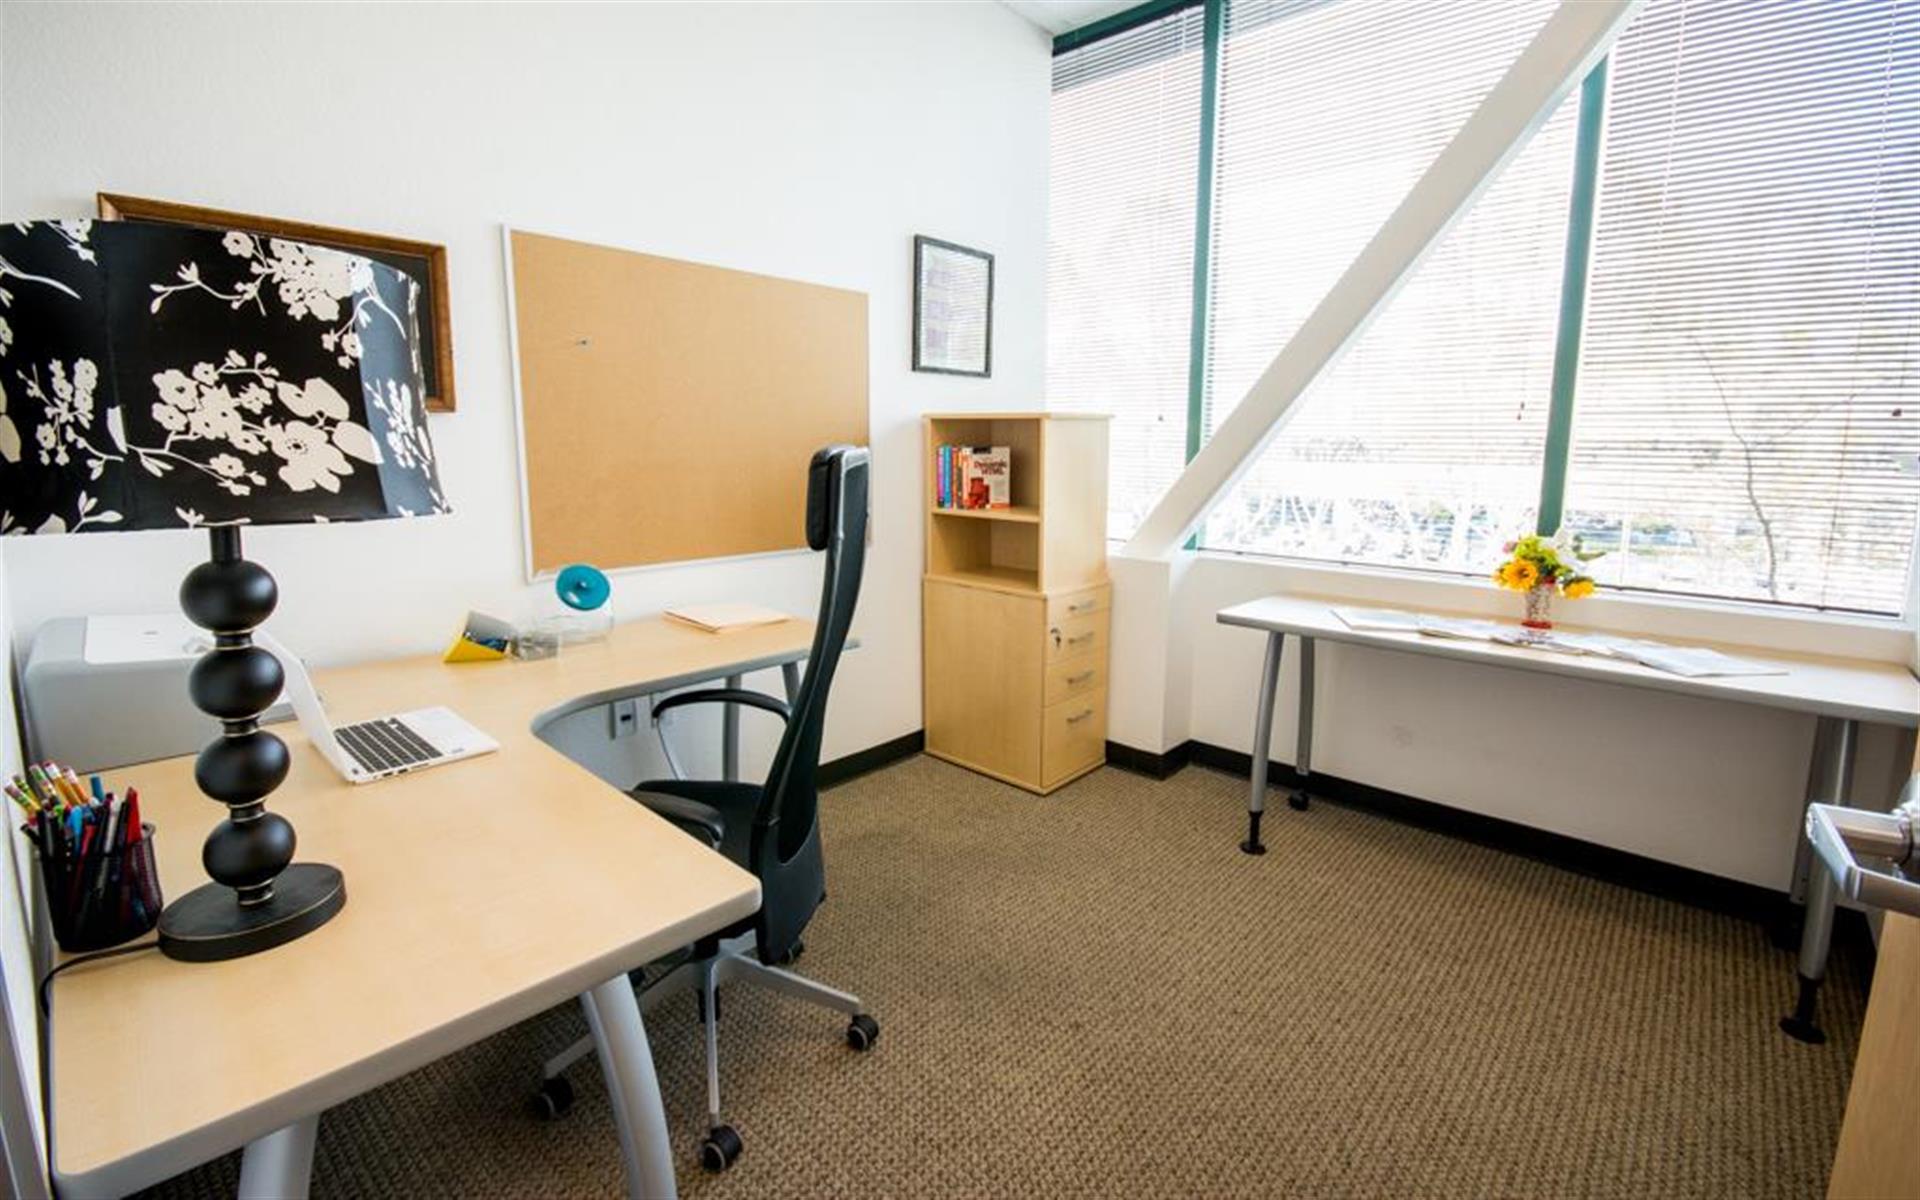 Innoworld - SUMMER SPECIAL Perimeter Private Office